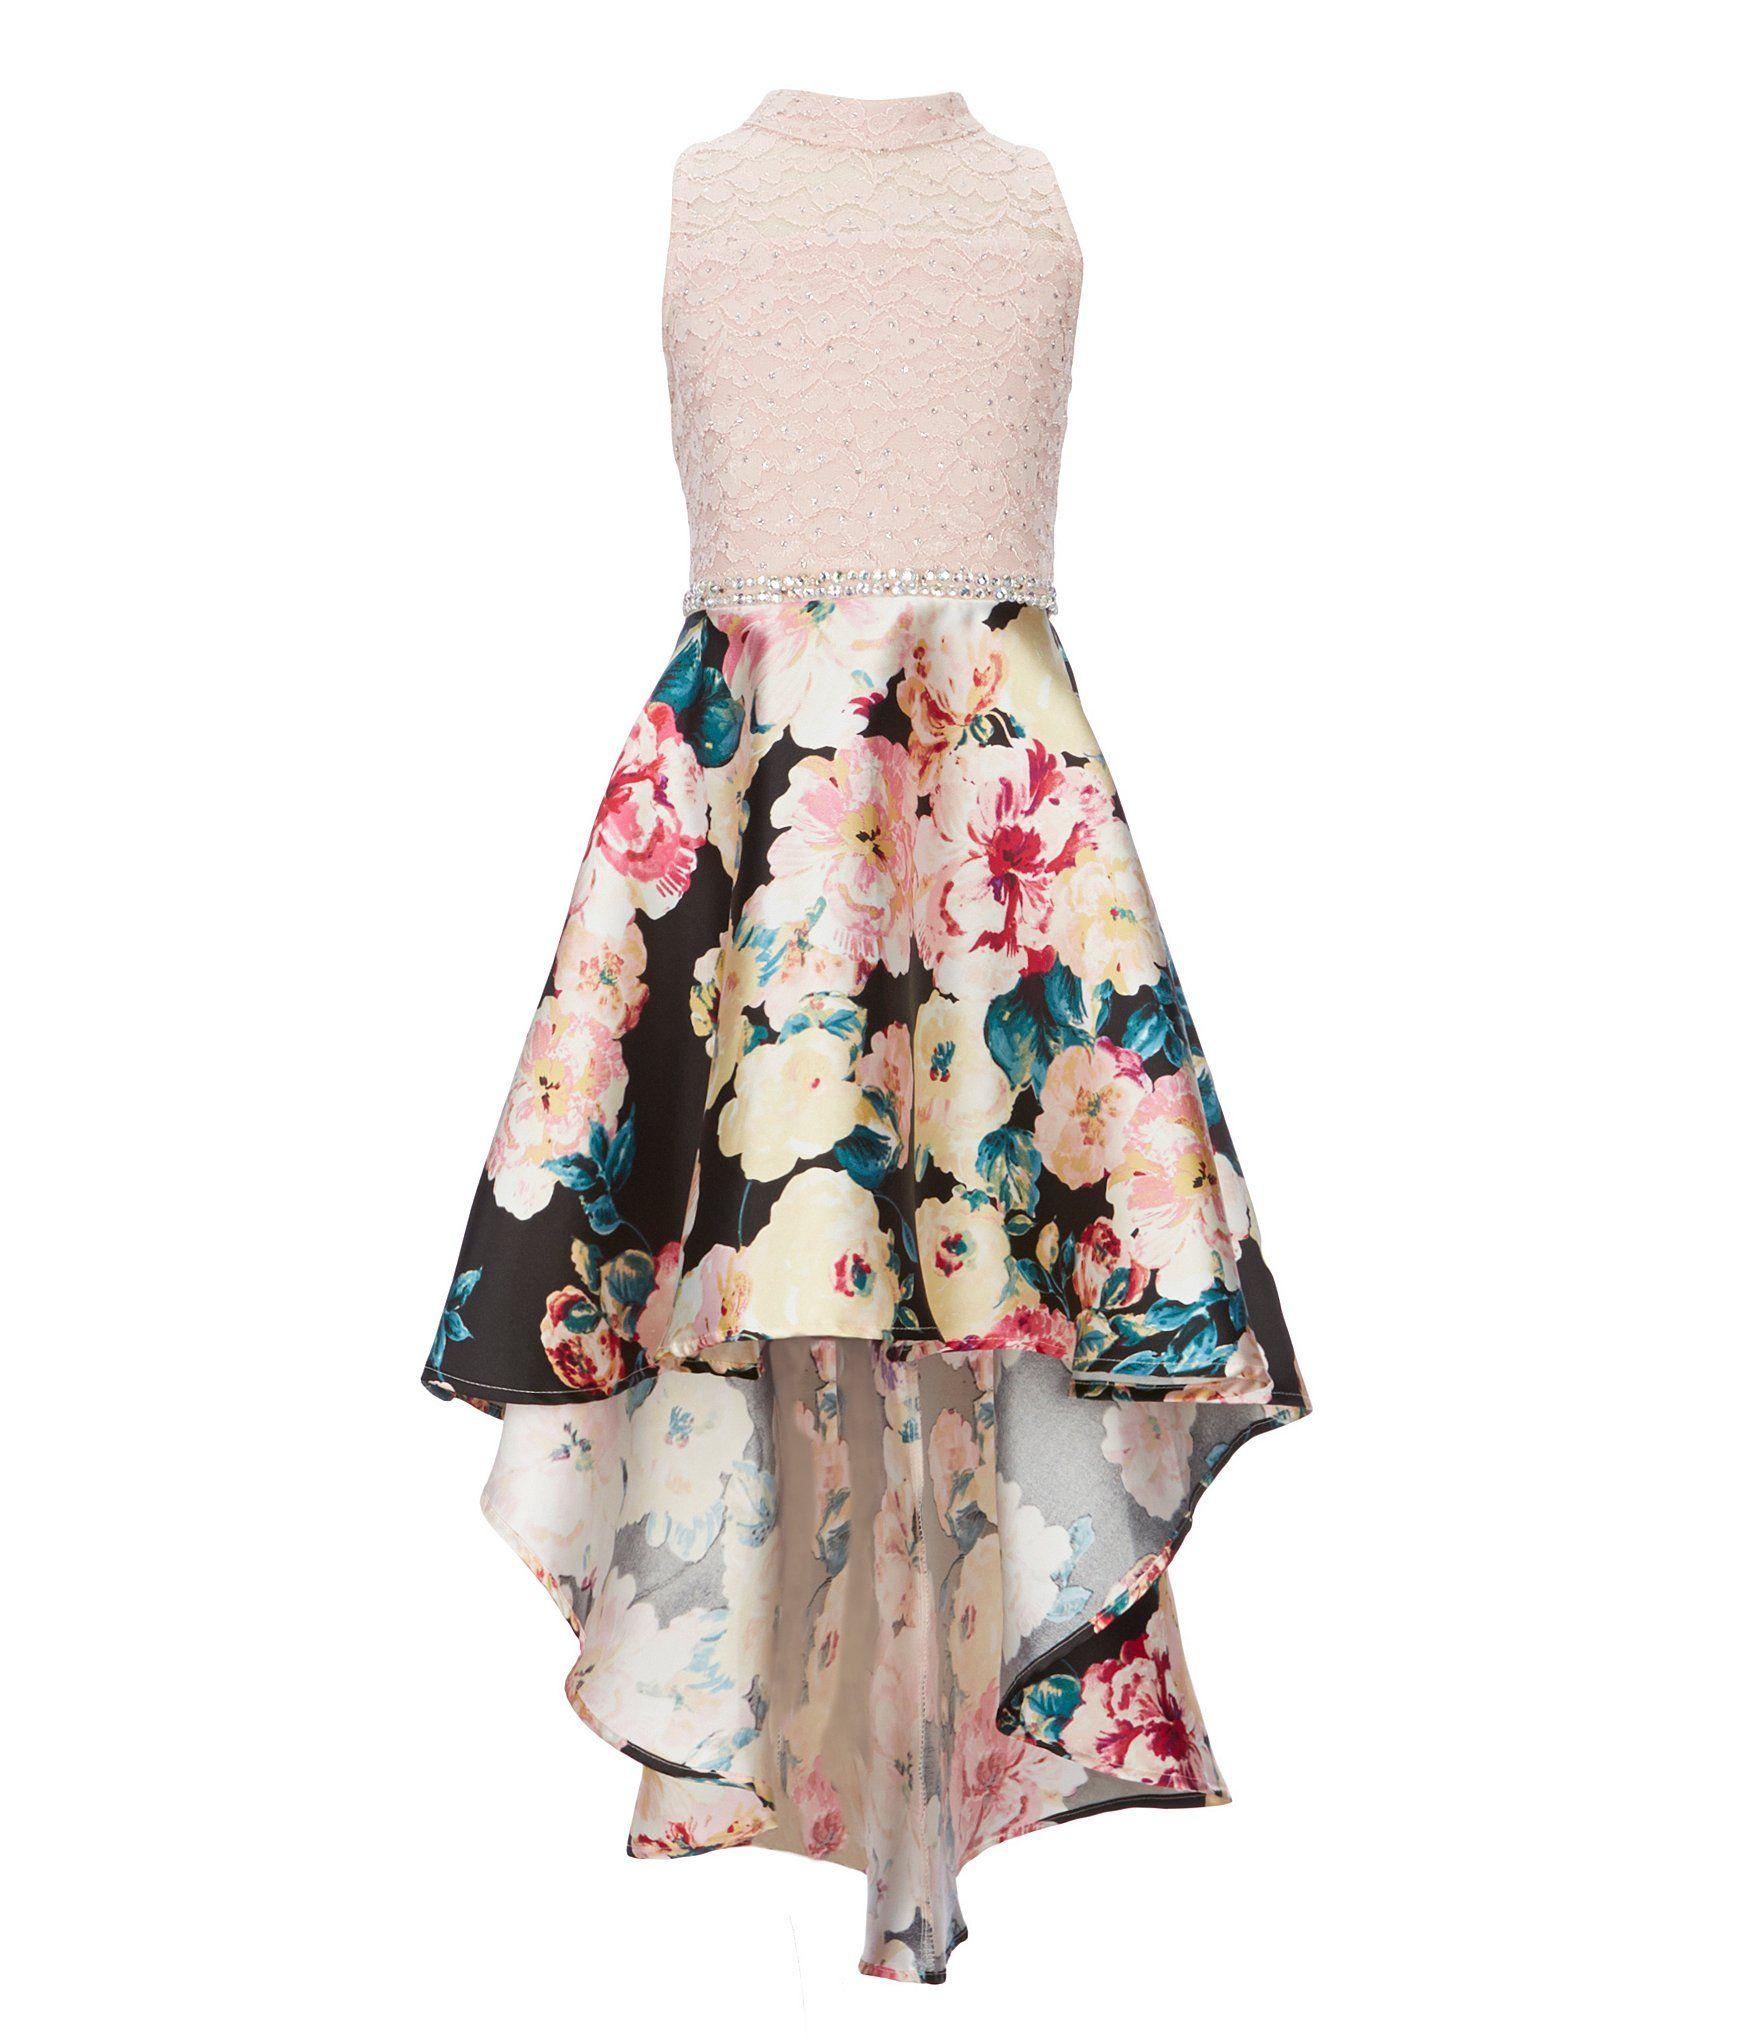 7552a693e Xtraordinary Big Girls 7-16 Embroidered Bodice High-Low Horse Hair Hem  Dress   Father Daughtr 2018 in 2019   Girls graduation dresses, Girls dance  dresses, ...